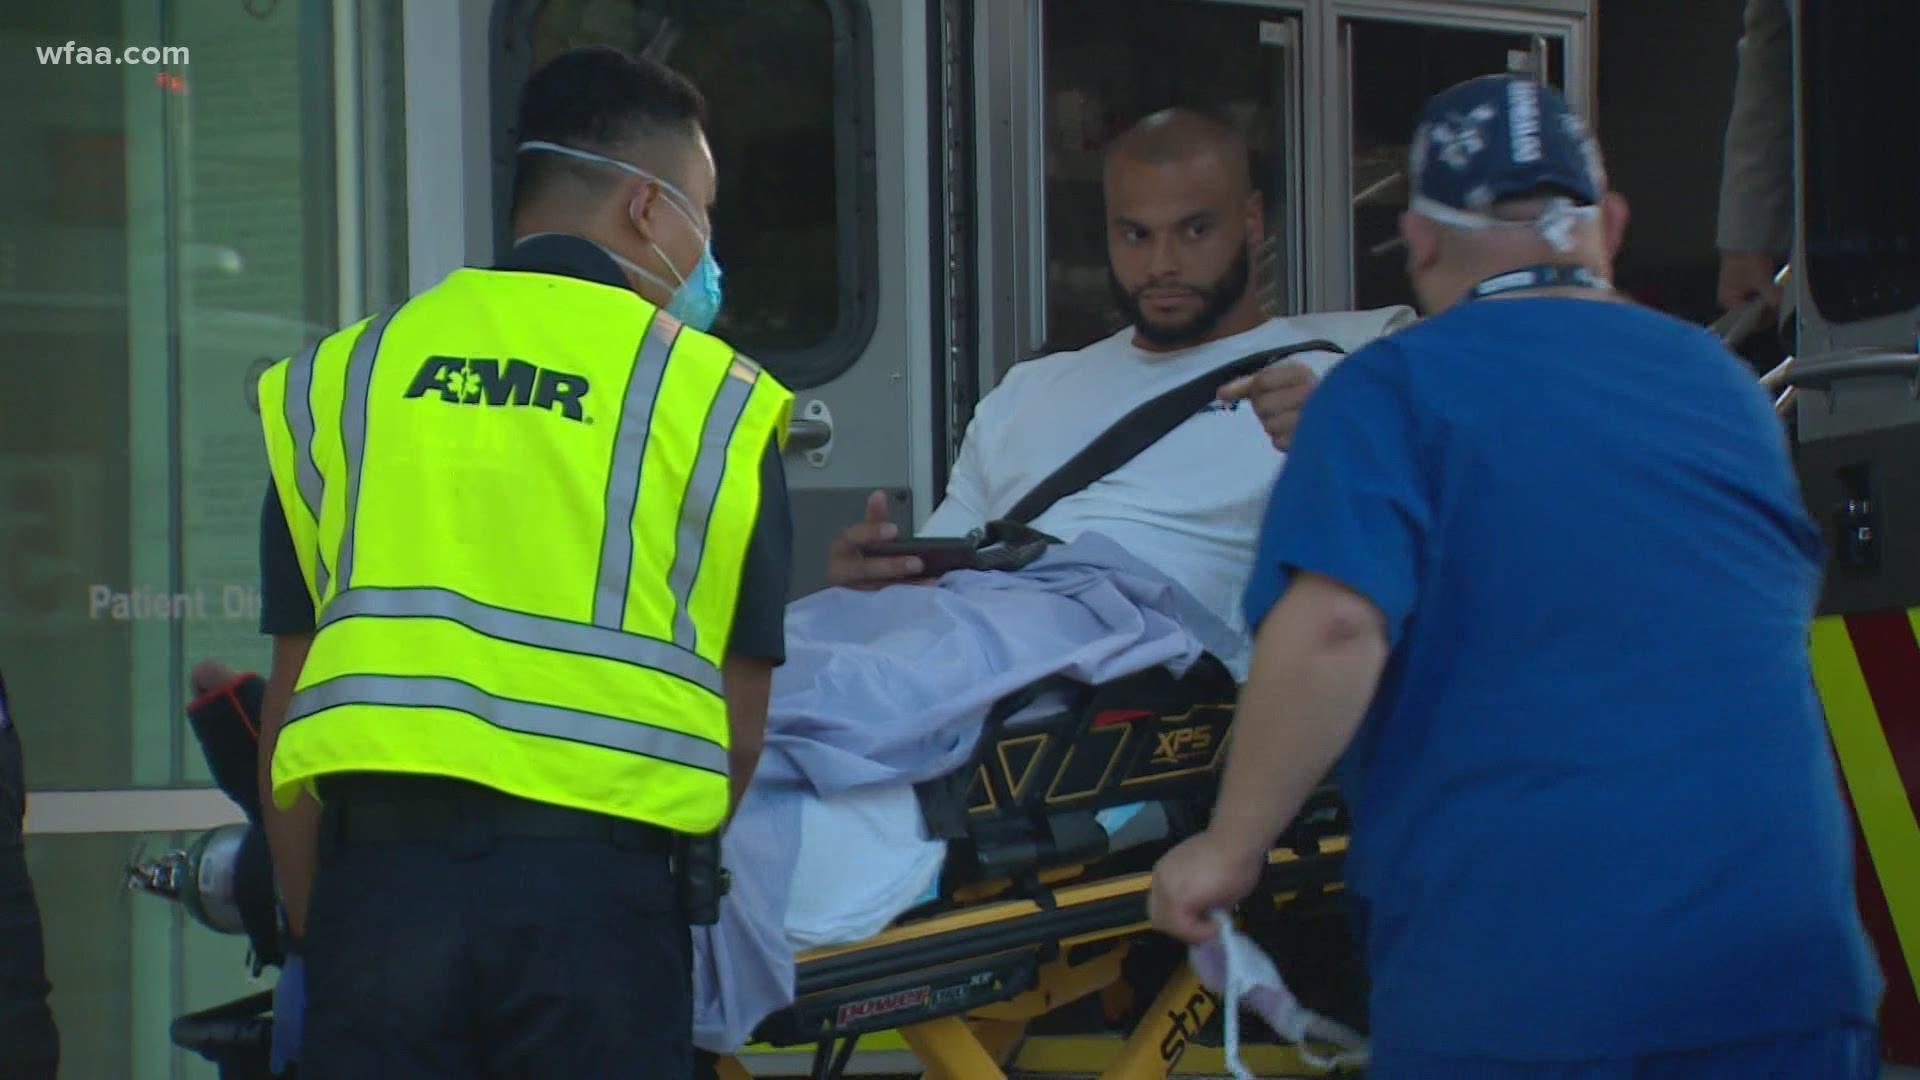 Dallas Cowboys Qb Dak Prescott Fractures Right Ankle Team Says Firstcoastnews Com